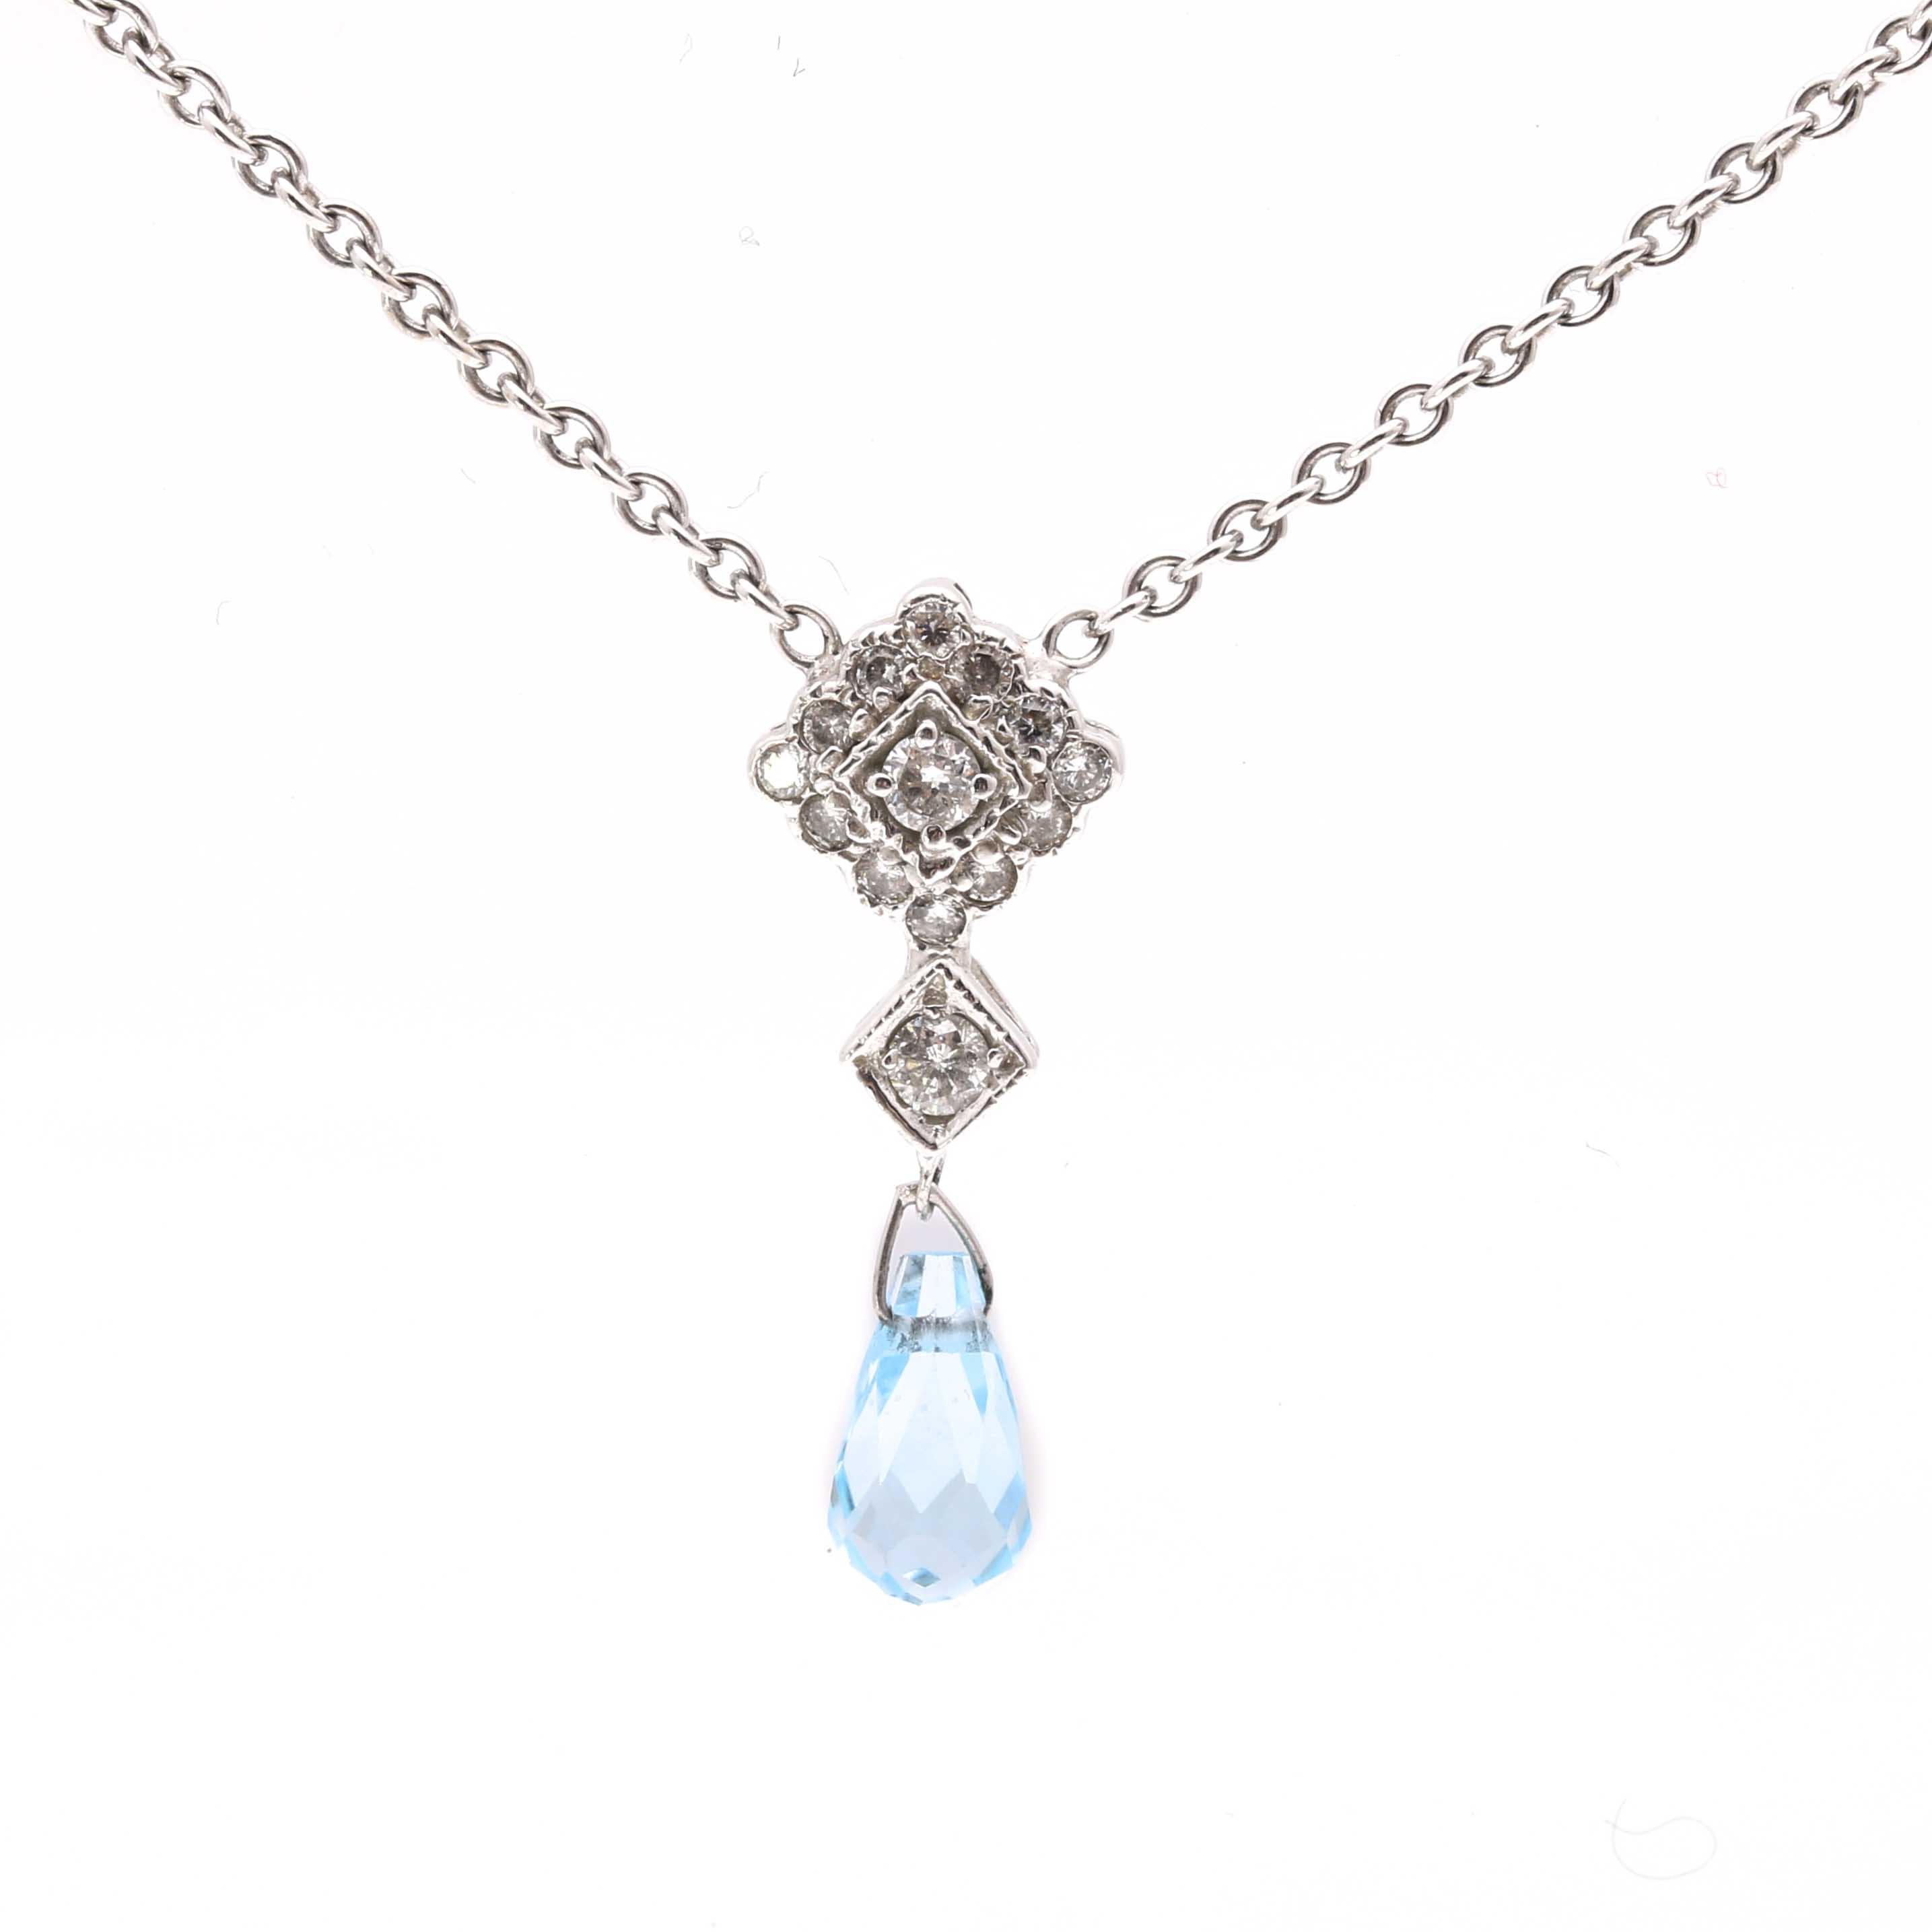 14K White Gold Diamond and Blue Topaz Necklace